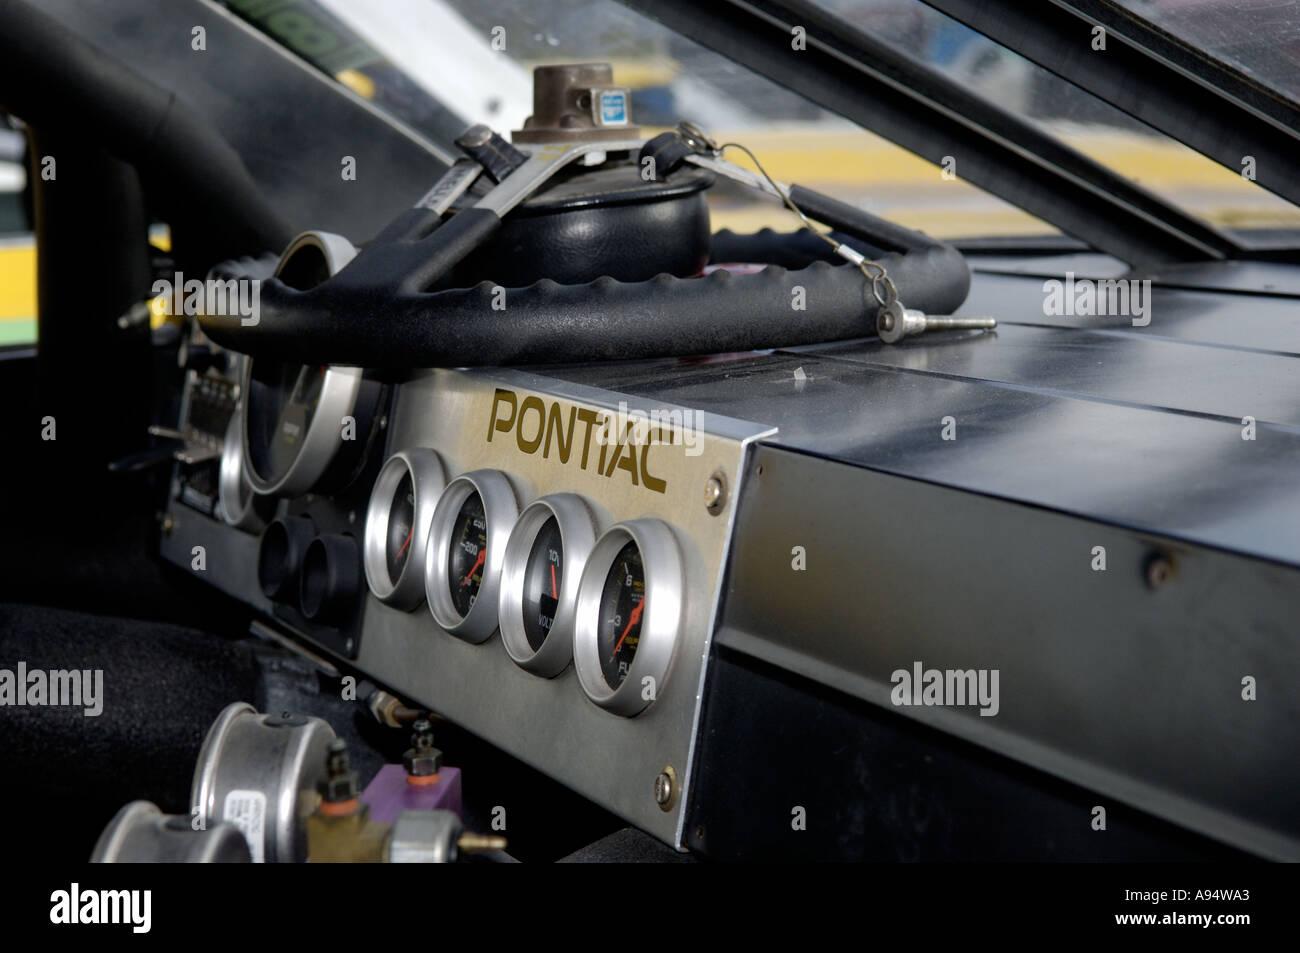 pontiac grand prix high resolution stock photography and images alamy https www alamy com interioror detail of a 1991 pontiac grand prix race car and the vintage image4000162 html